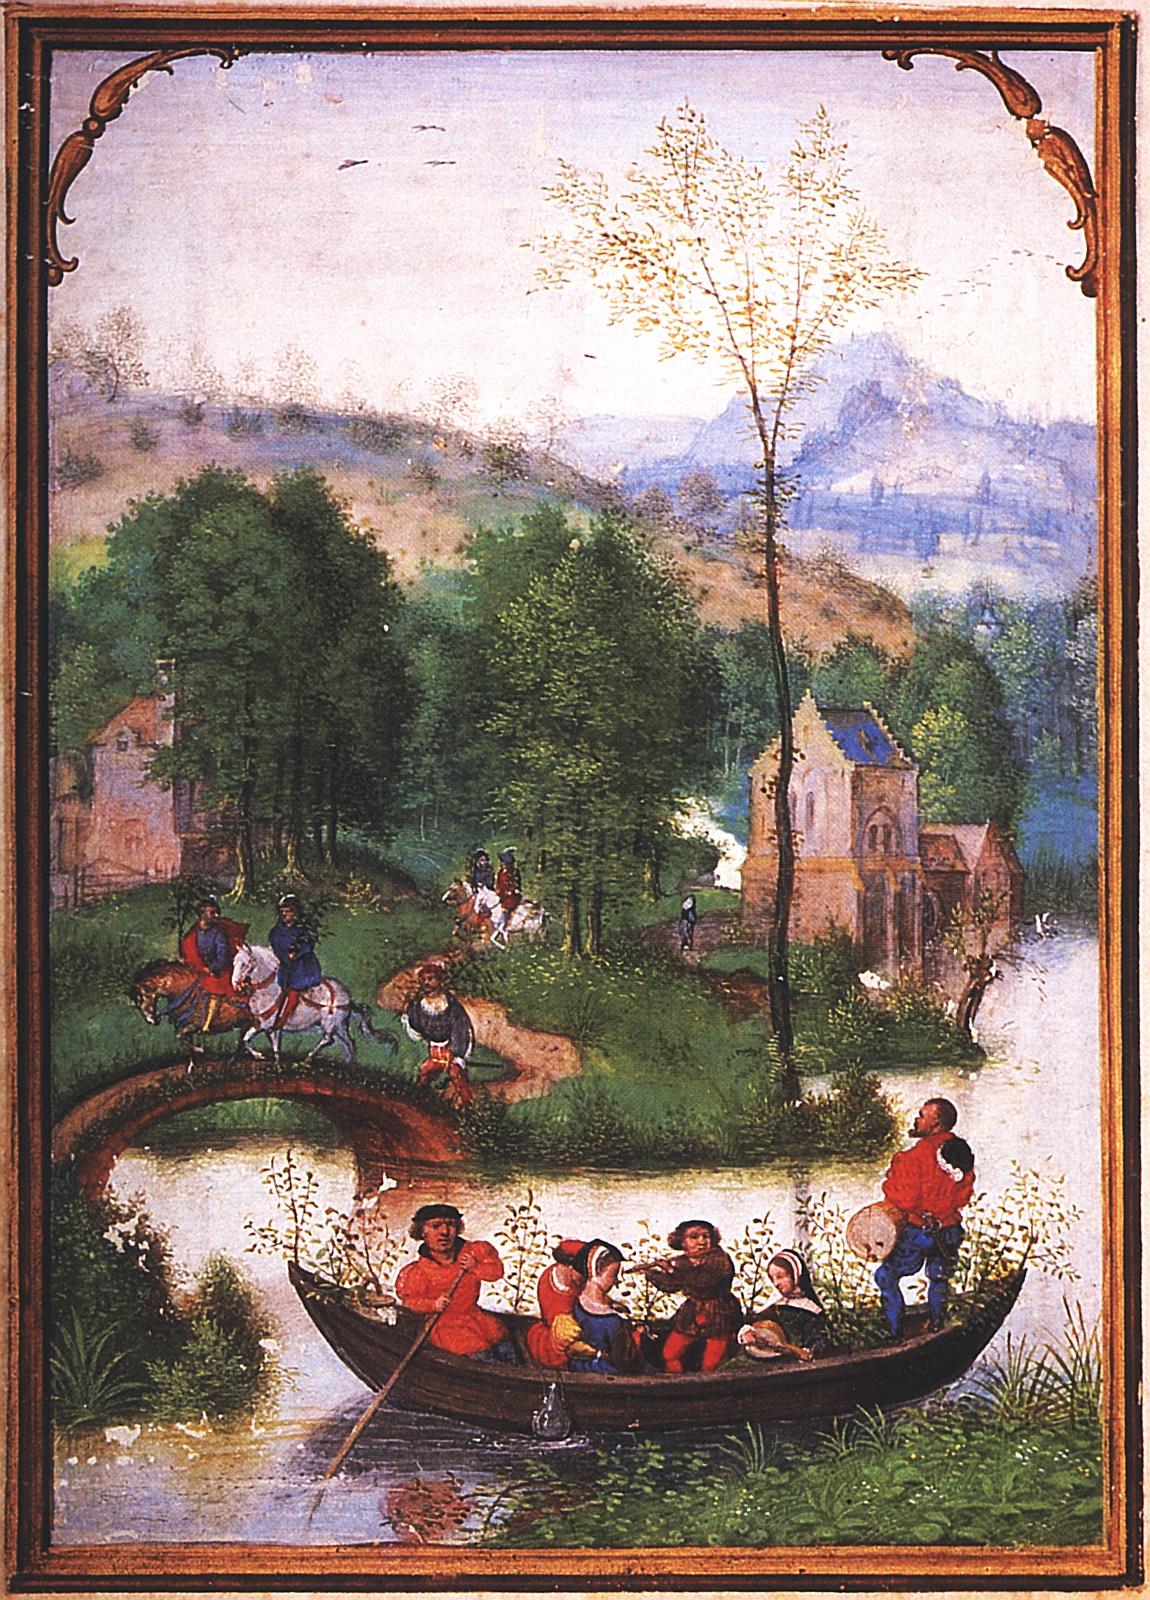 Variante der Maifahrt: Bootstour junger Leute mit Musik inmitten grüner Landschaft. Simon Bening, 1. Hälfte 16. Jh. München, StB, cod. lat. 23638, fol. 6v.